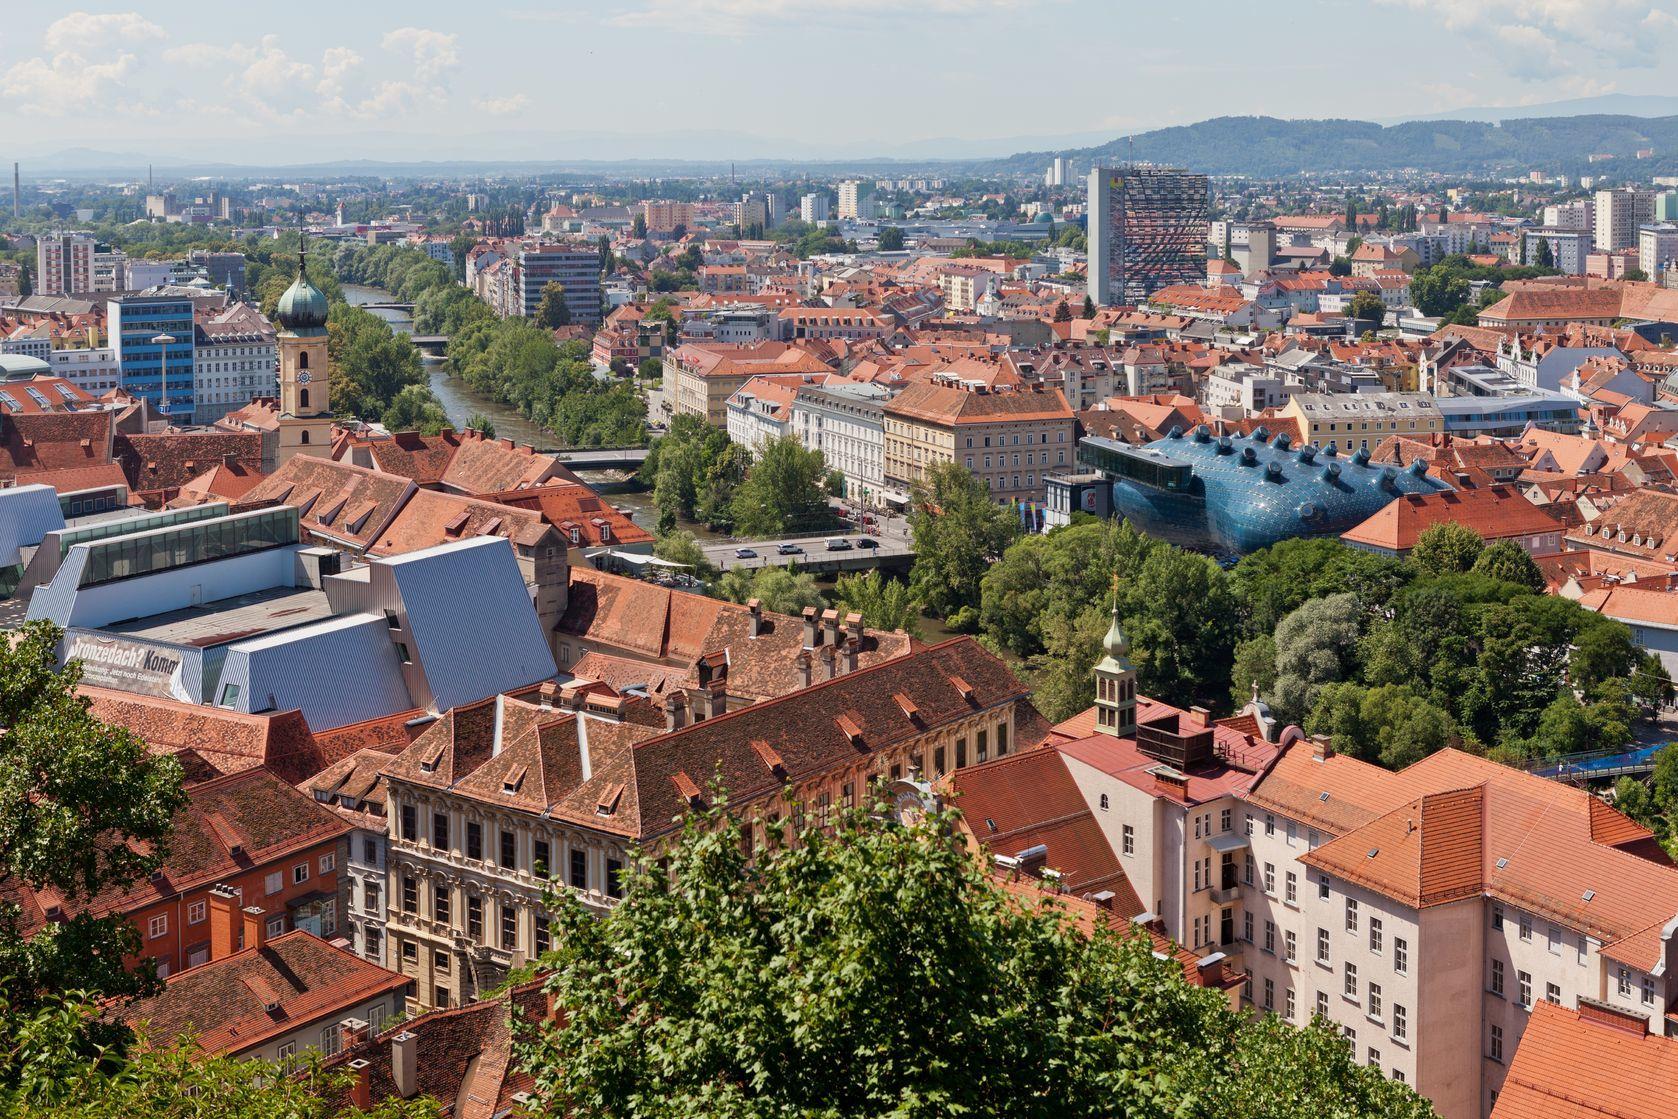 Letecký pohled na centrum města Graz | deymos/123RF.com